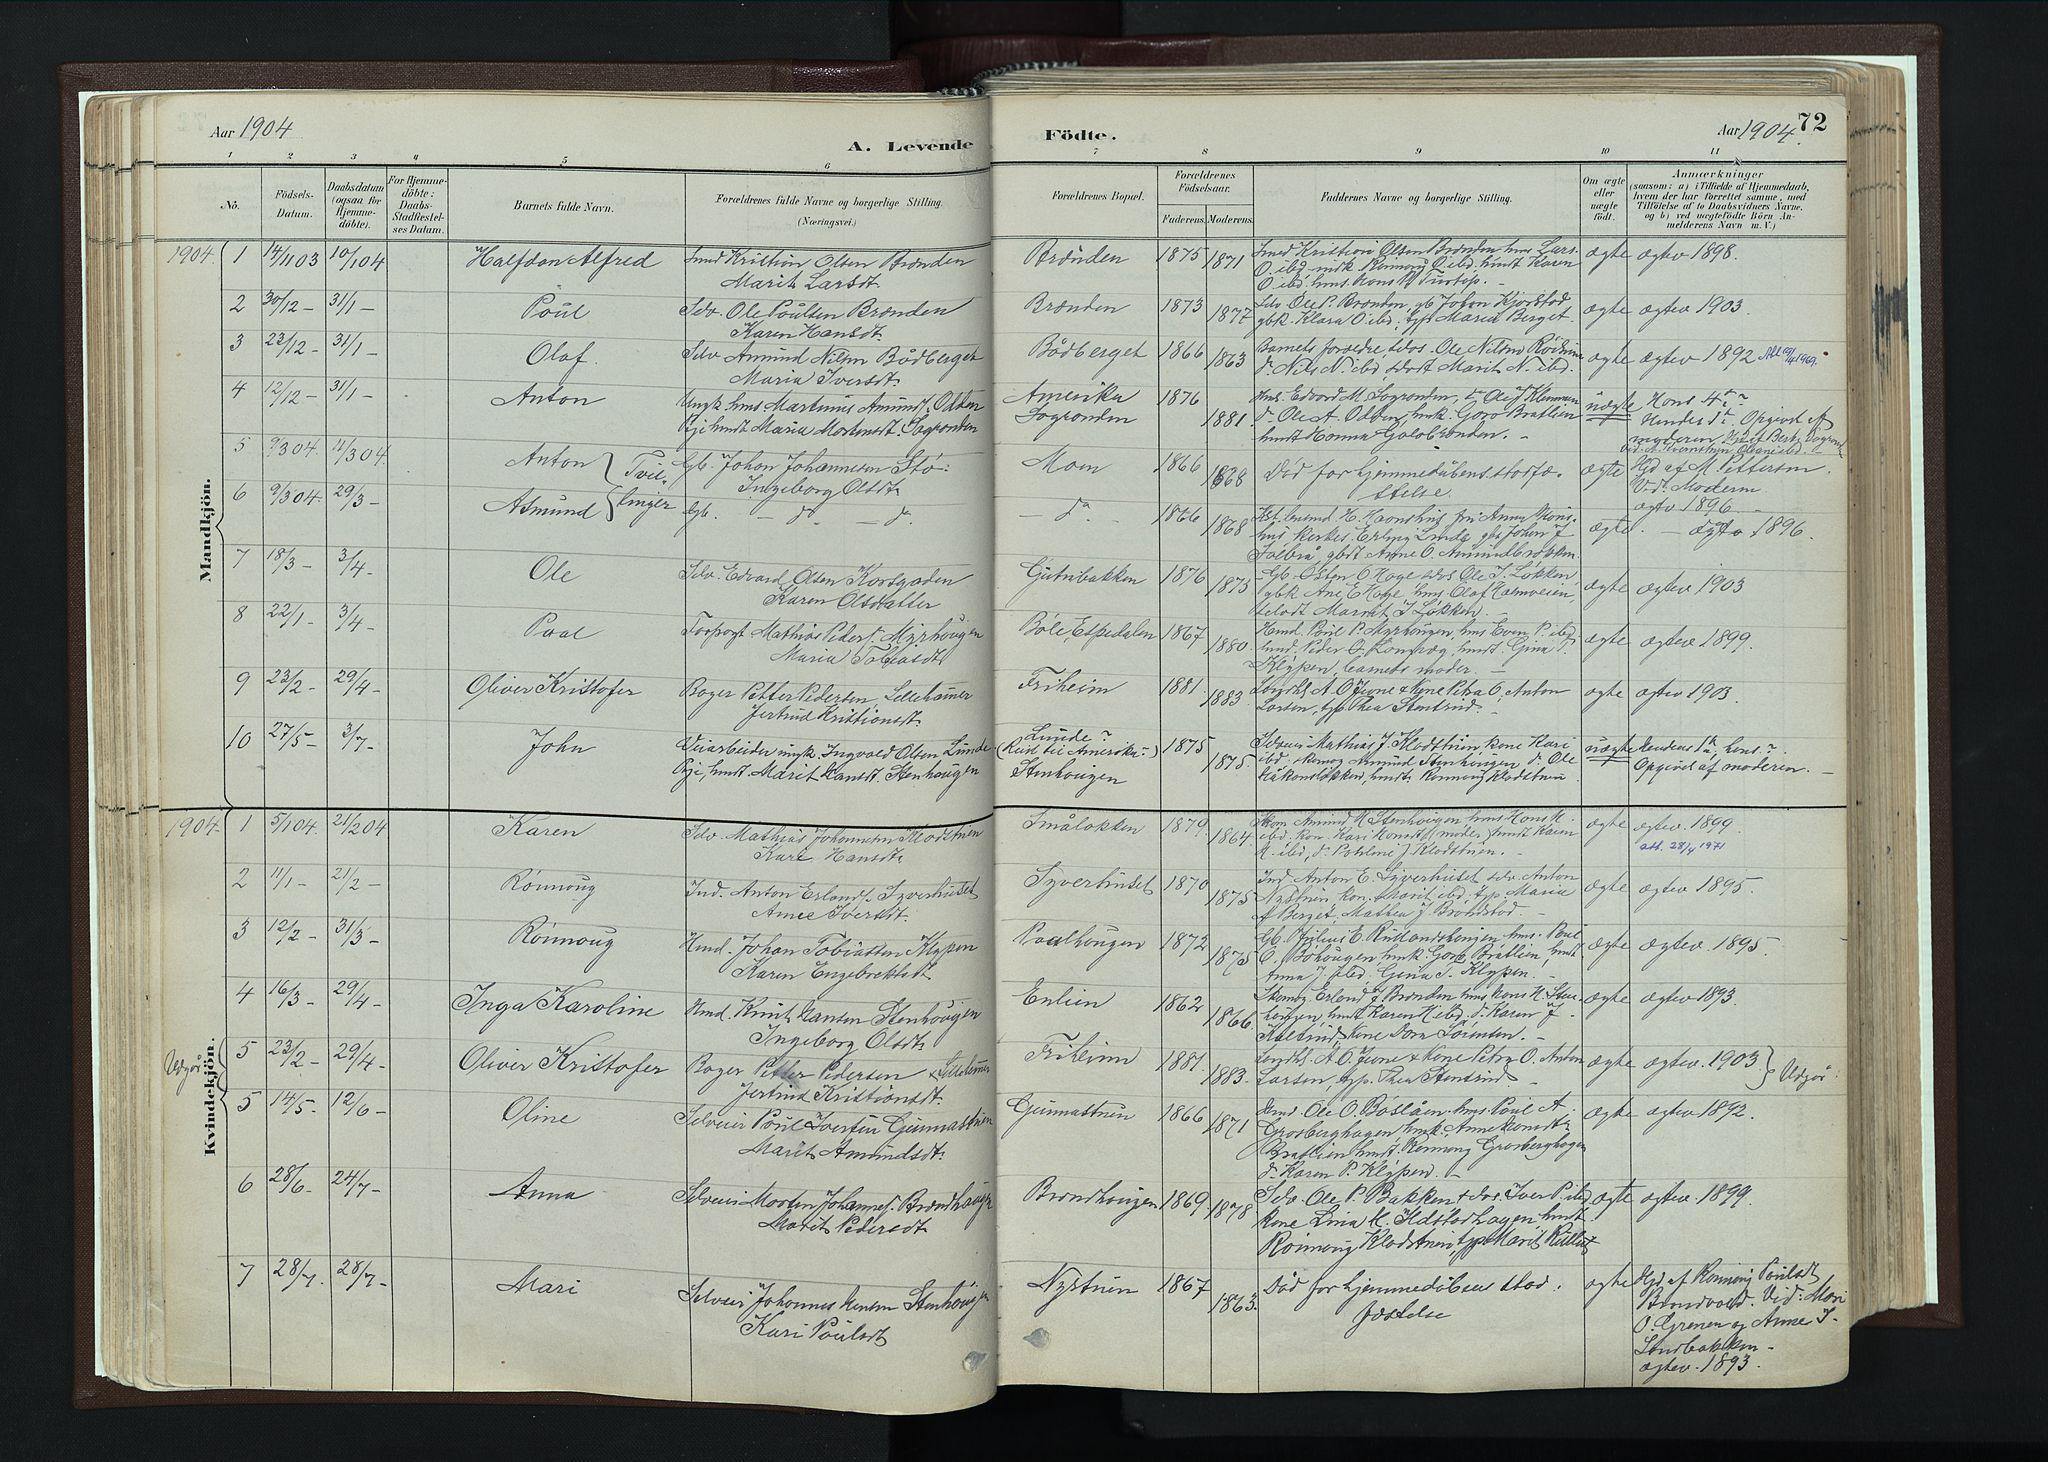 SAH, Nord-Fron prestekontor, Ministerialbok nr. 4, 1884-1914, s. 72